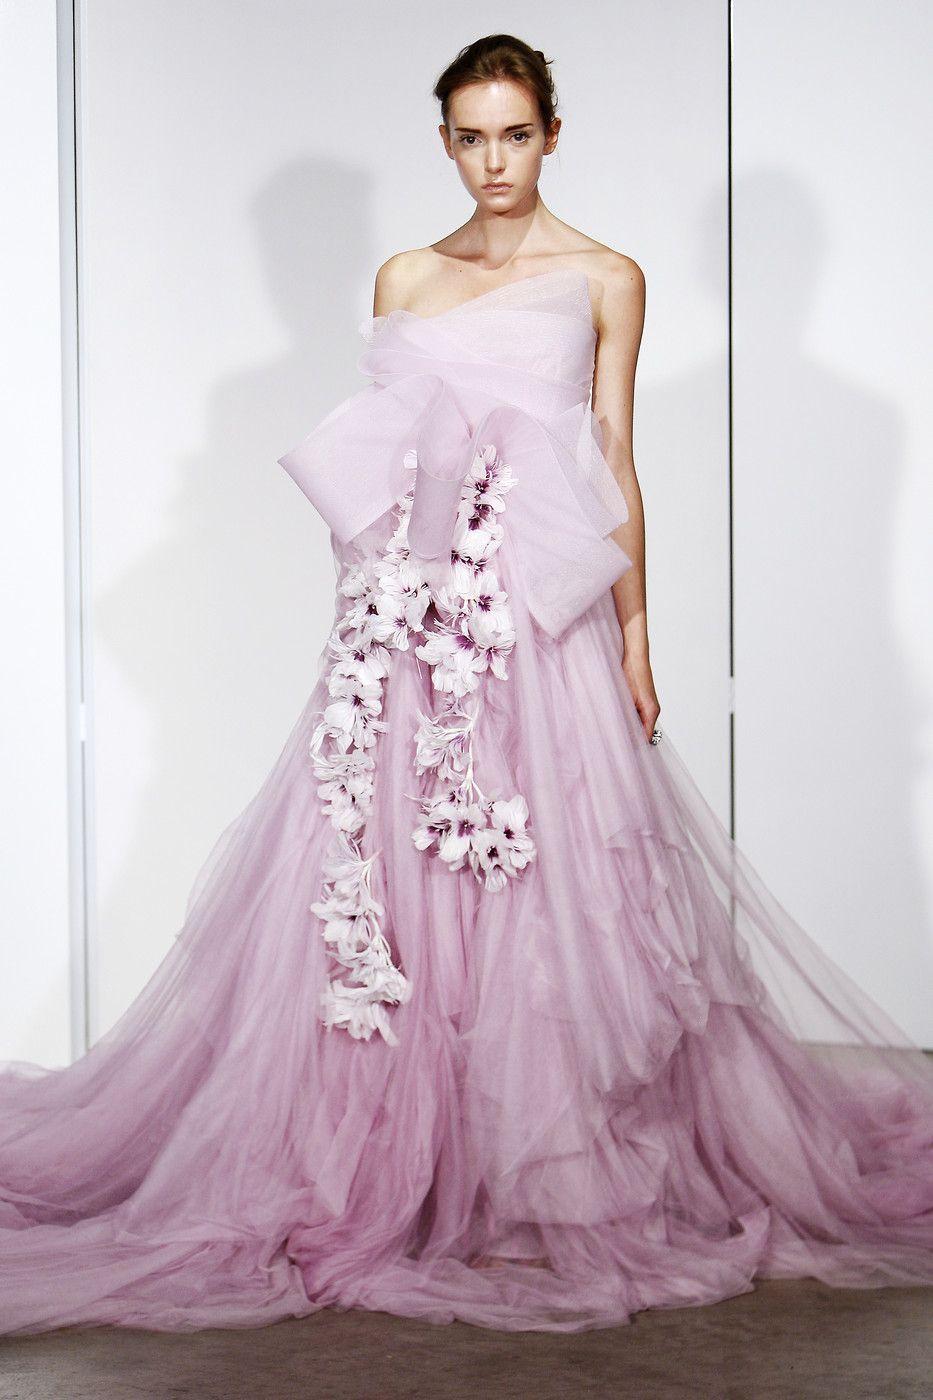 Marchesa at New York Fashion Week Spring 2009 - StyleBistro